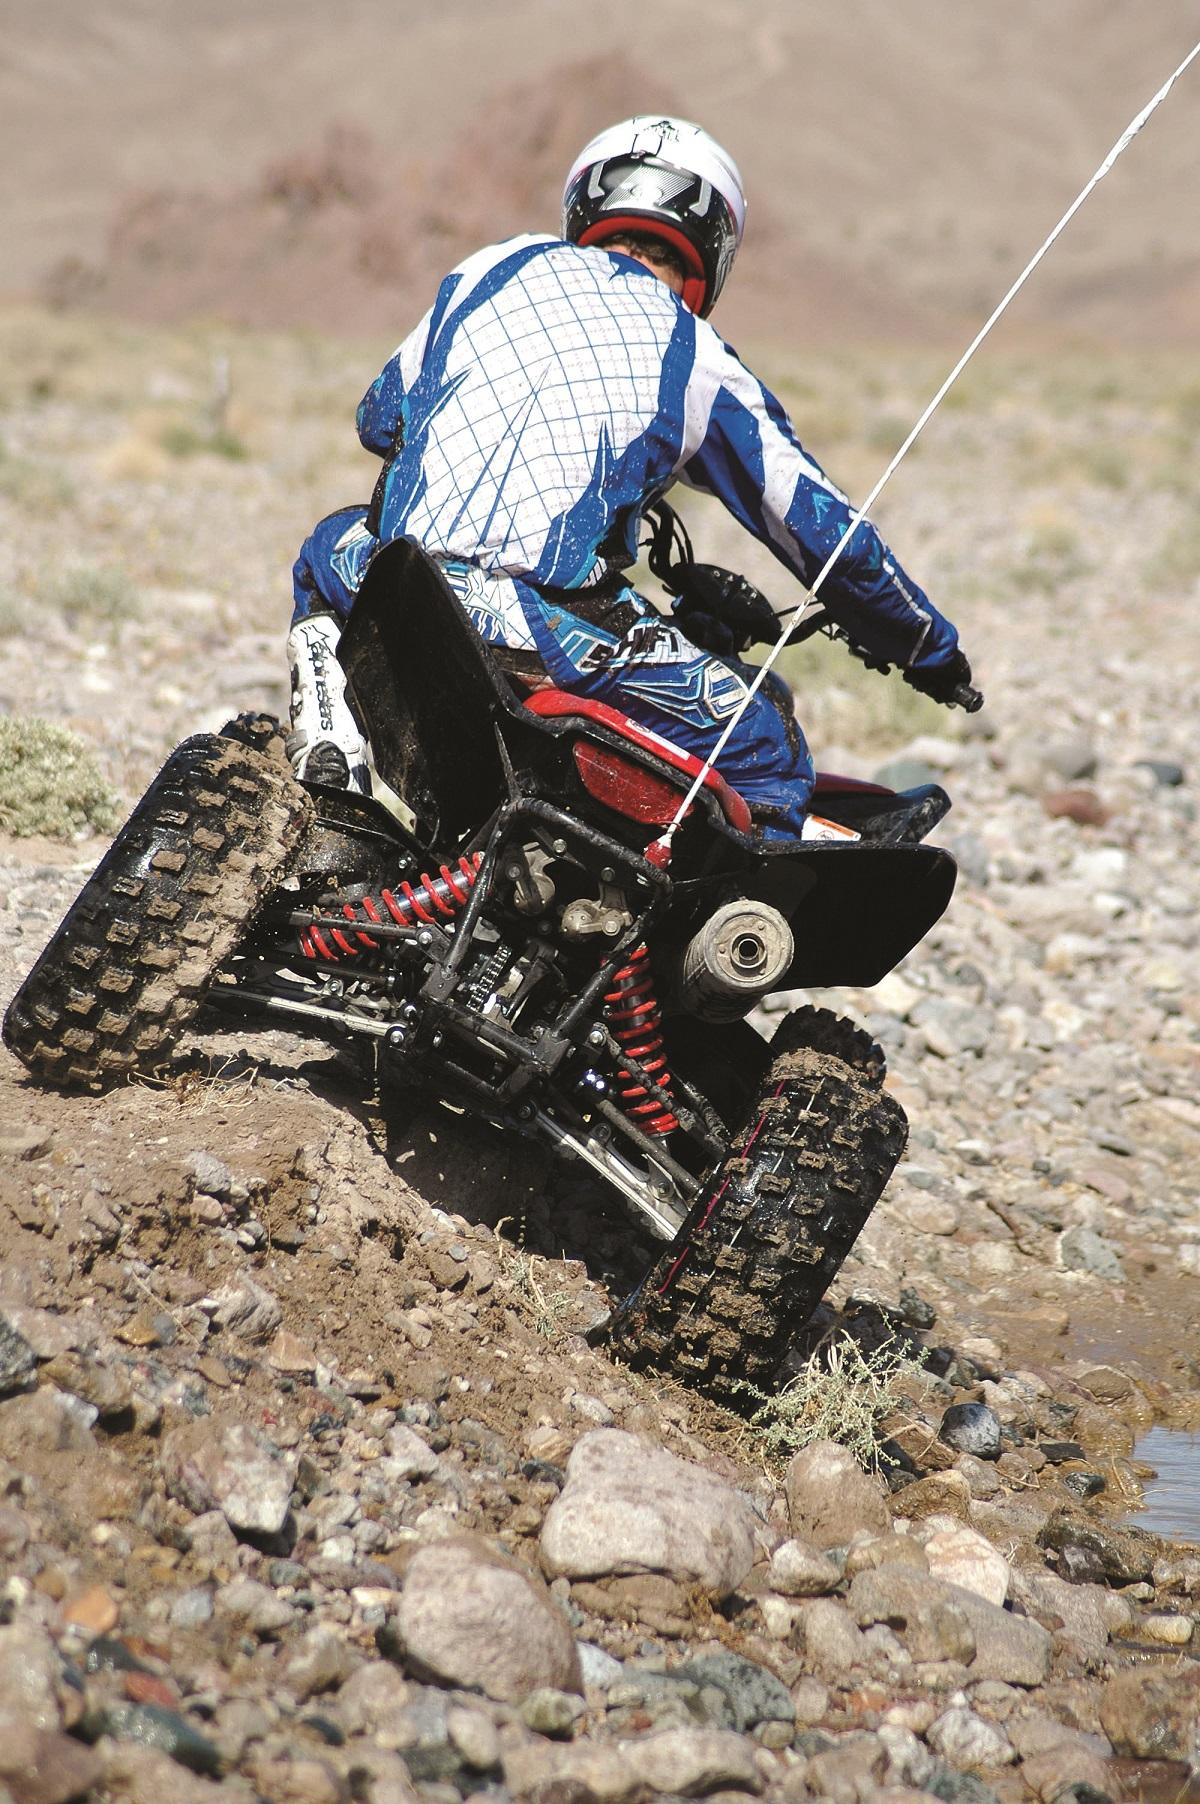 Shootout 2008 Raptor 700 Vs Honda 700x Dirt Wheels Magazine 08 Sport Trac Fuel Filter Hon700xx Nikon 260